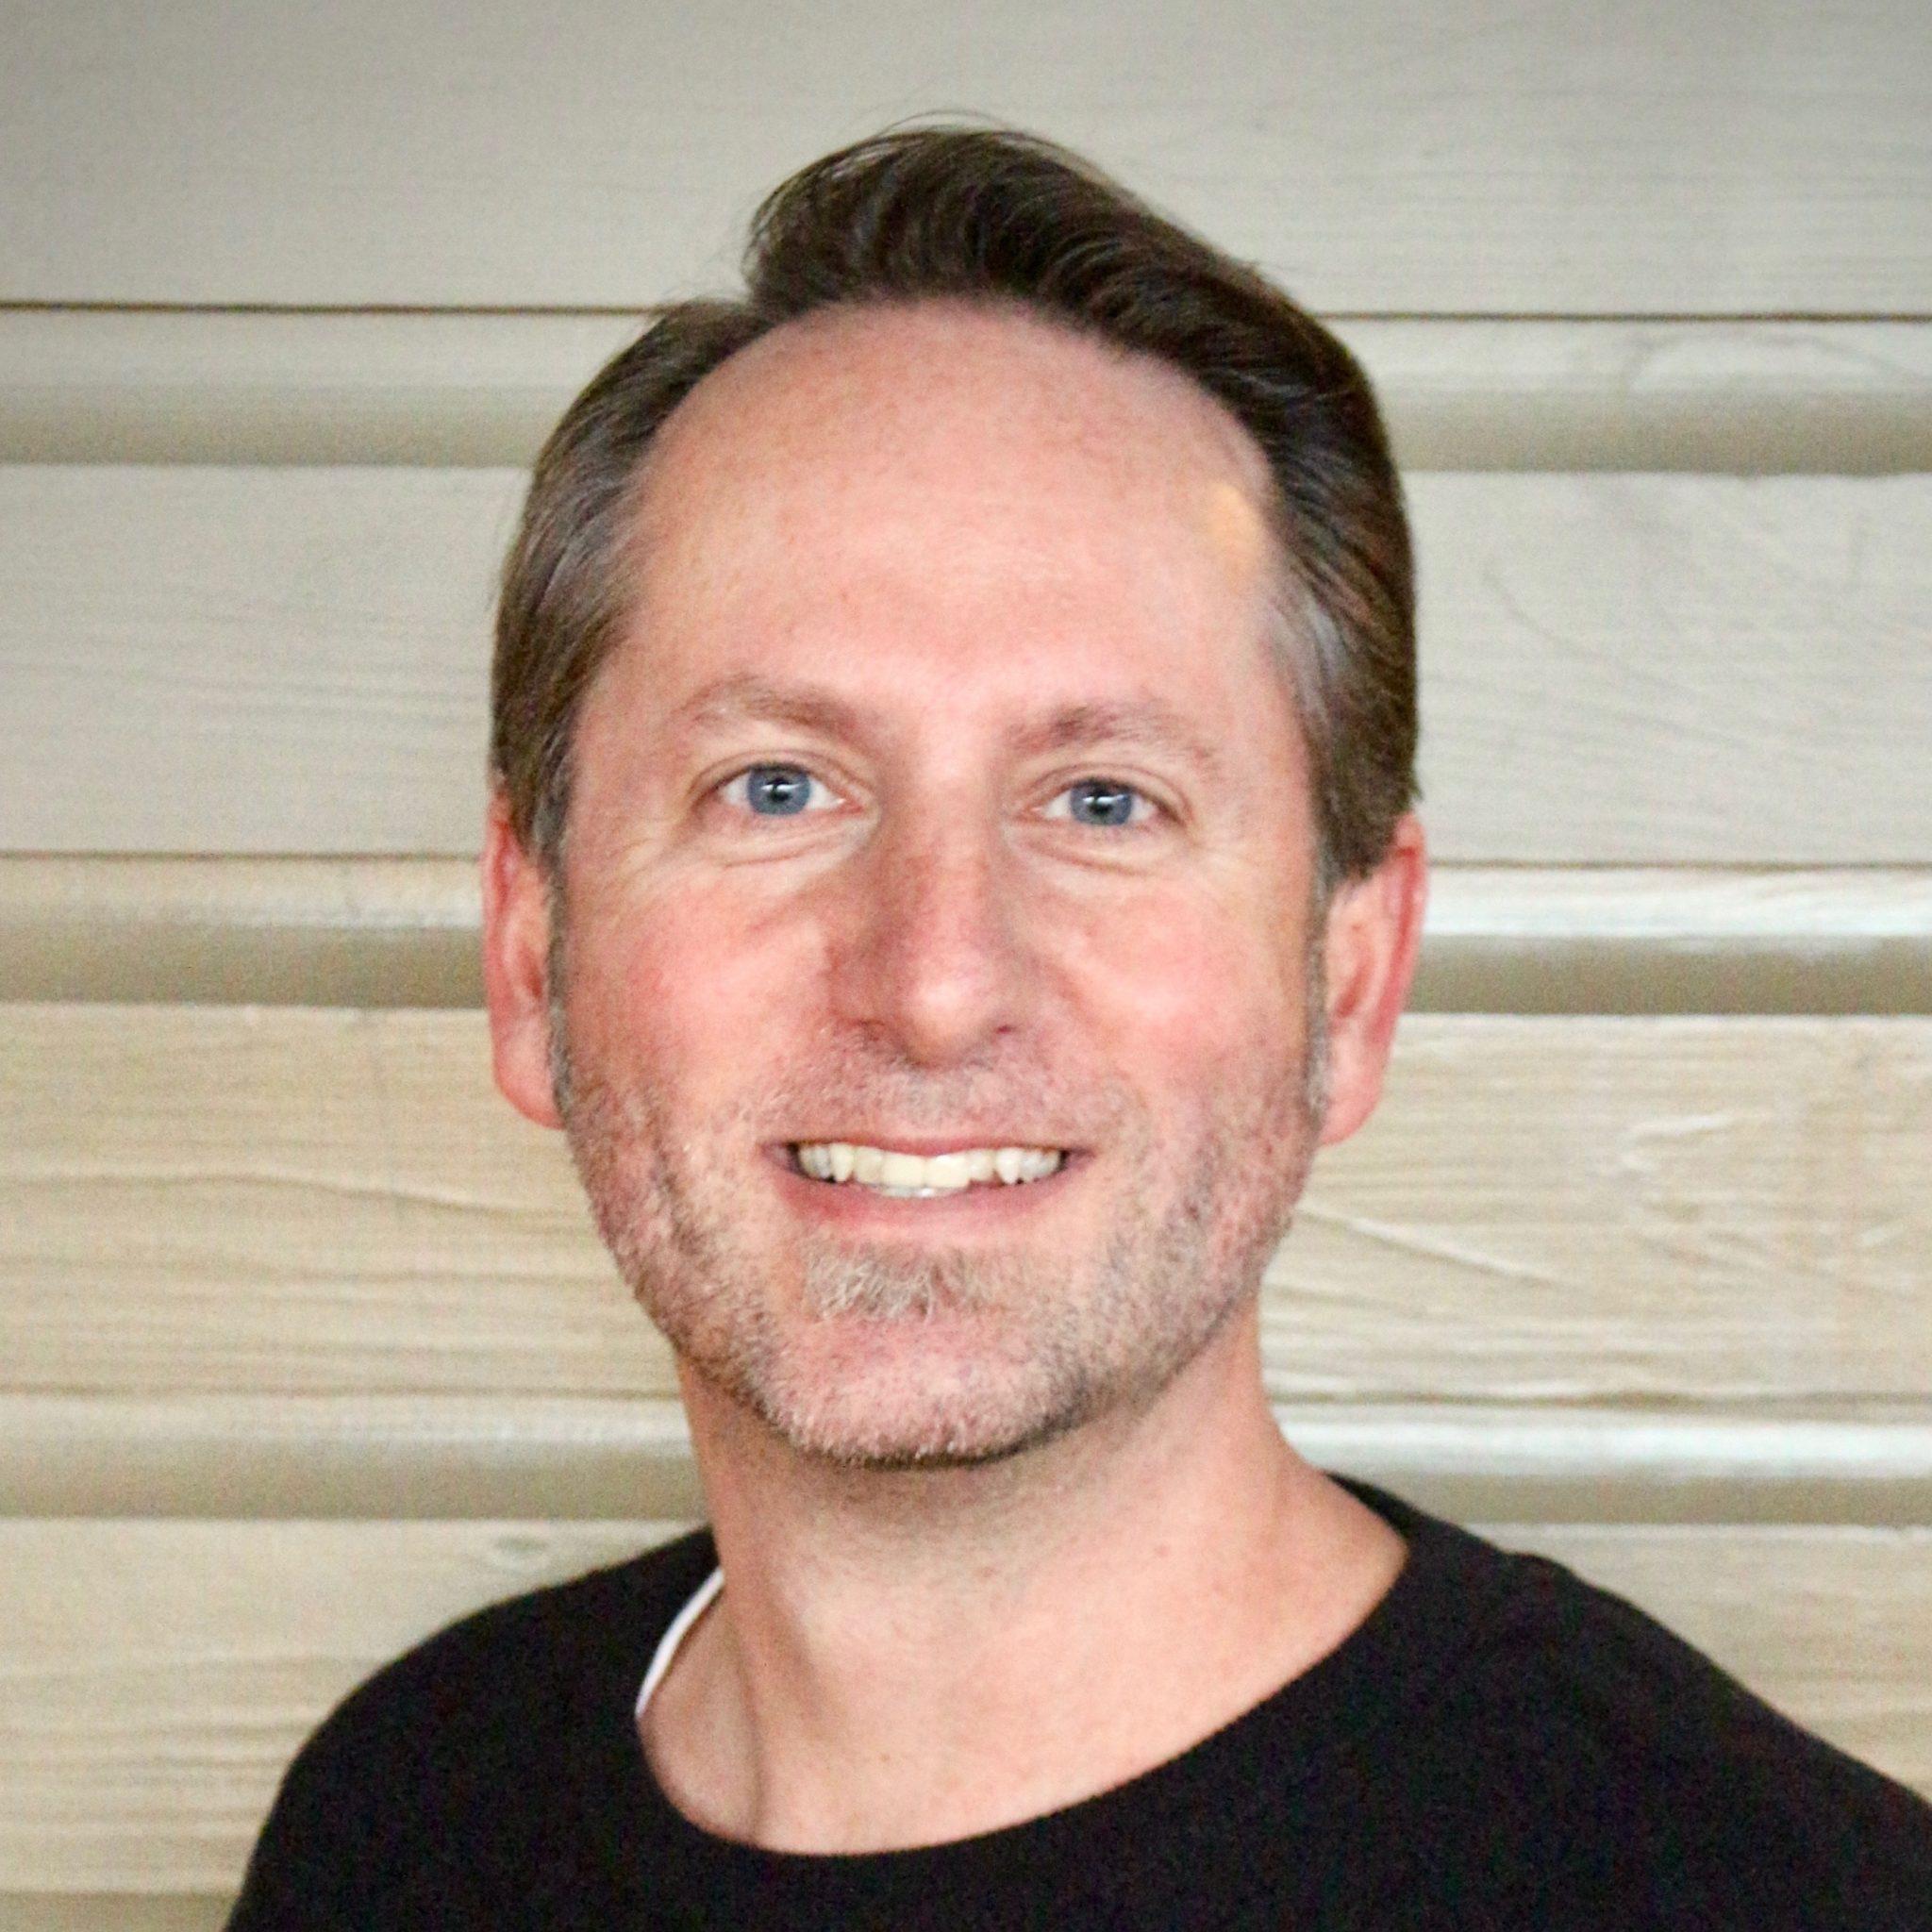 Jason Kirkpatrick, MS, LPC